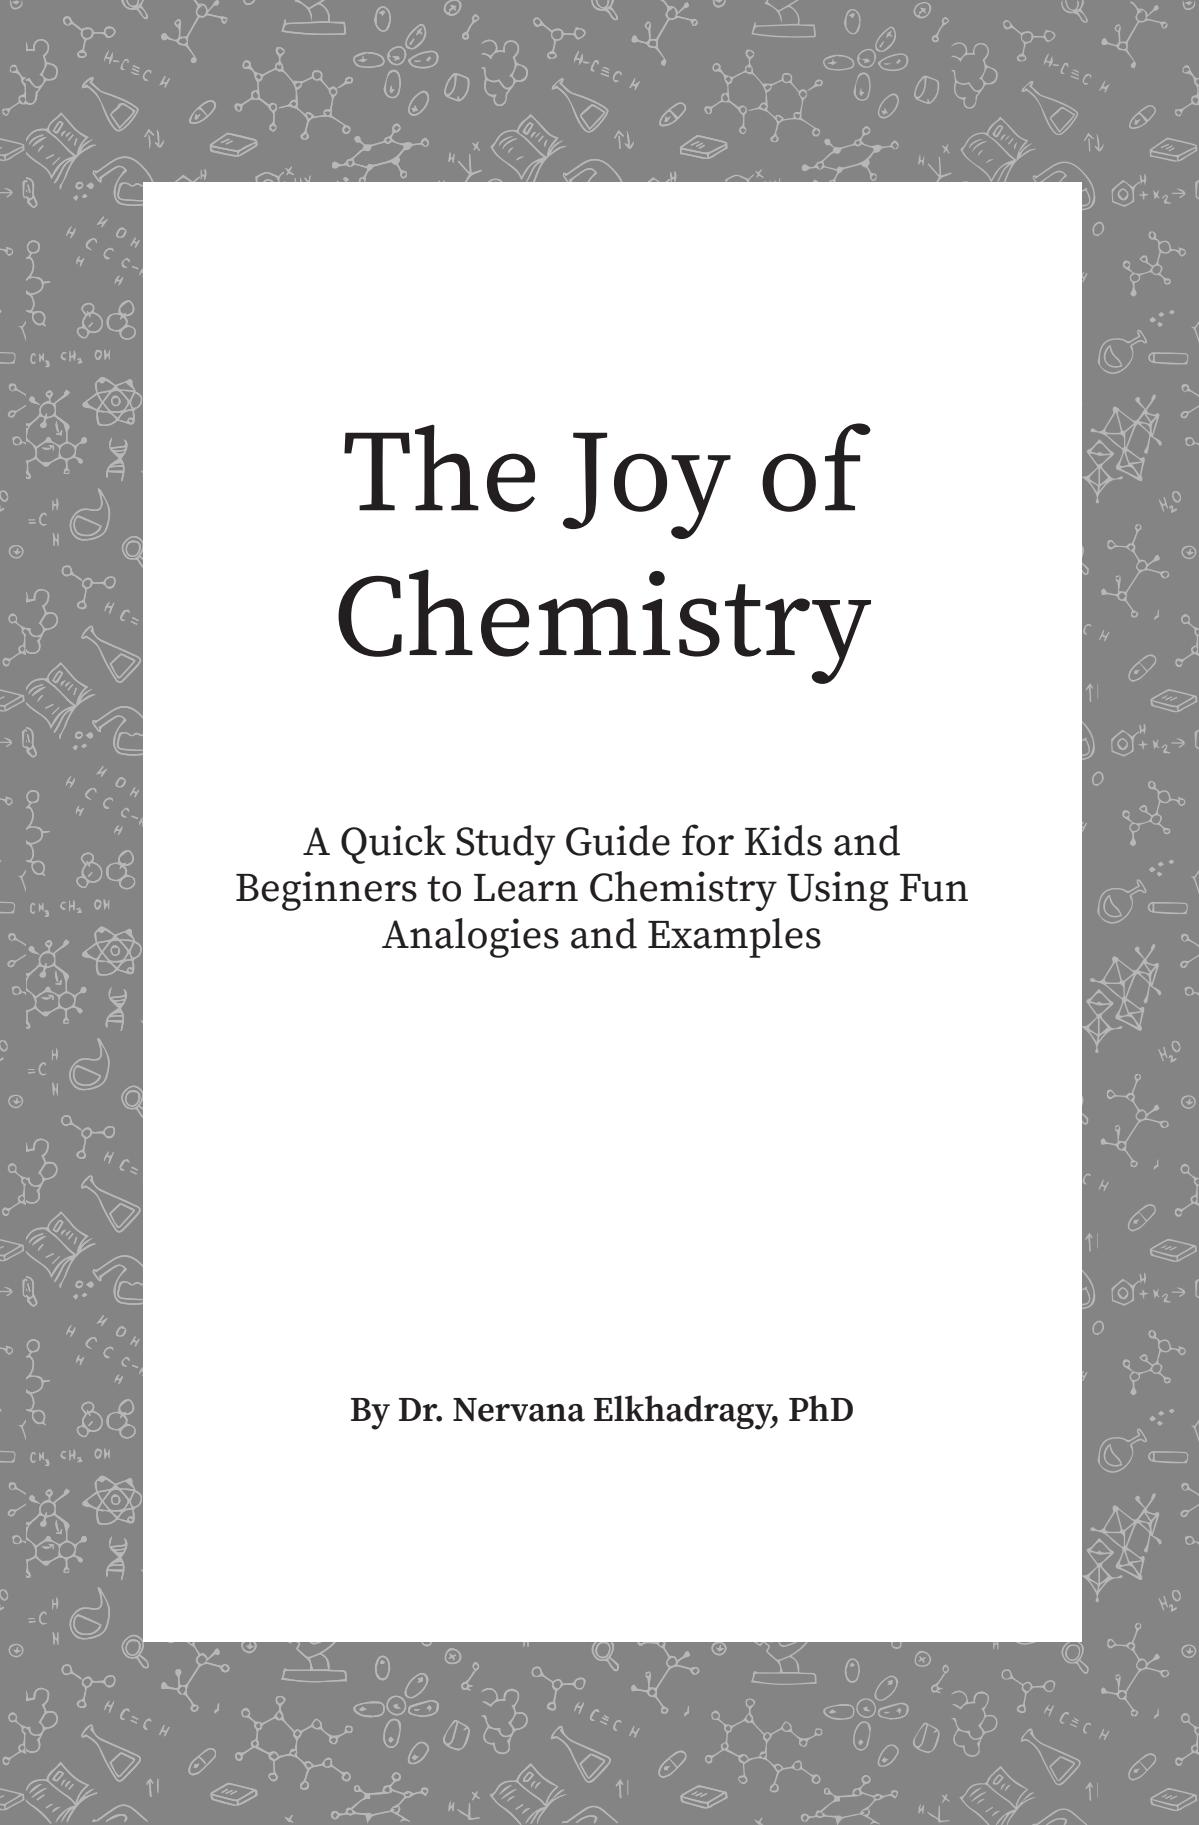 Book formatting 5.5x8.5 PDF